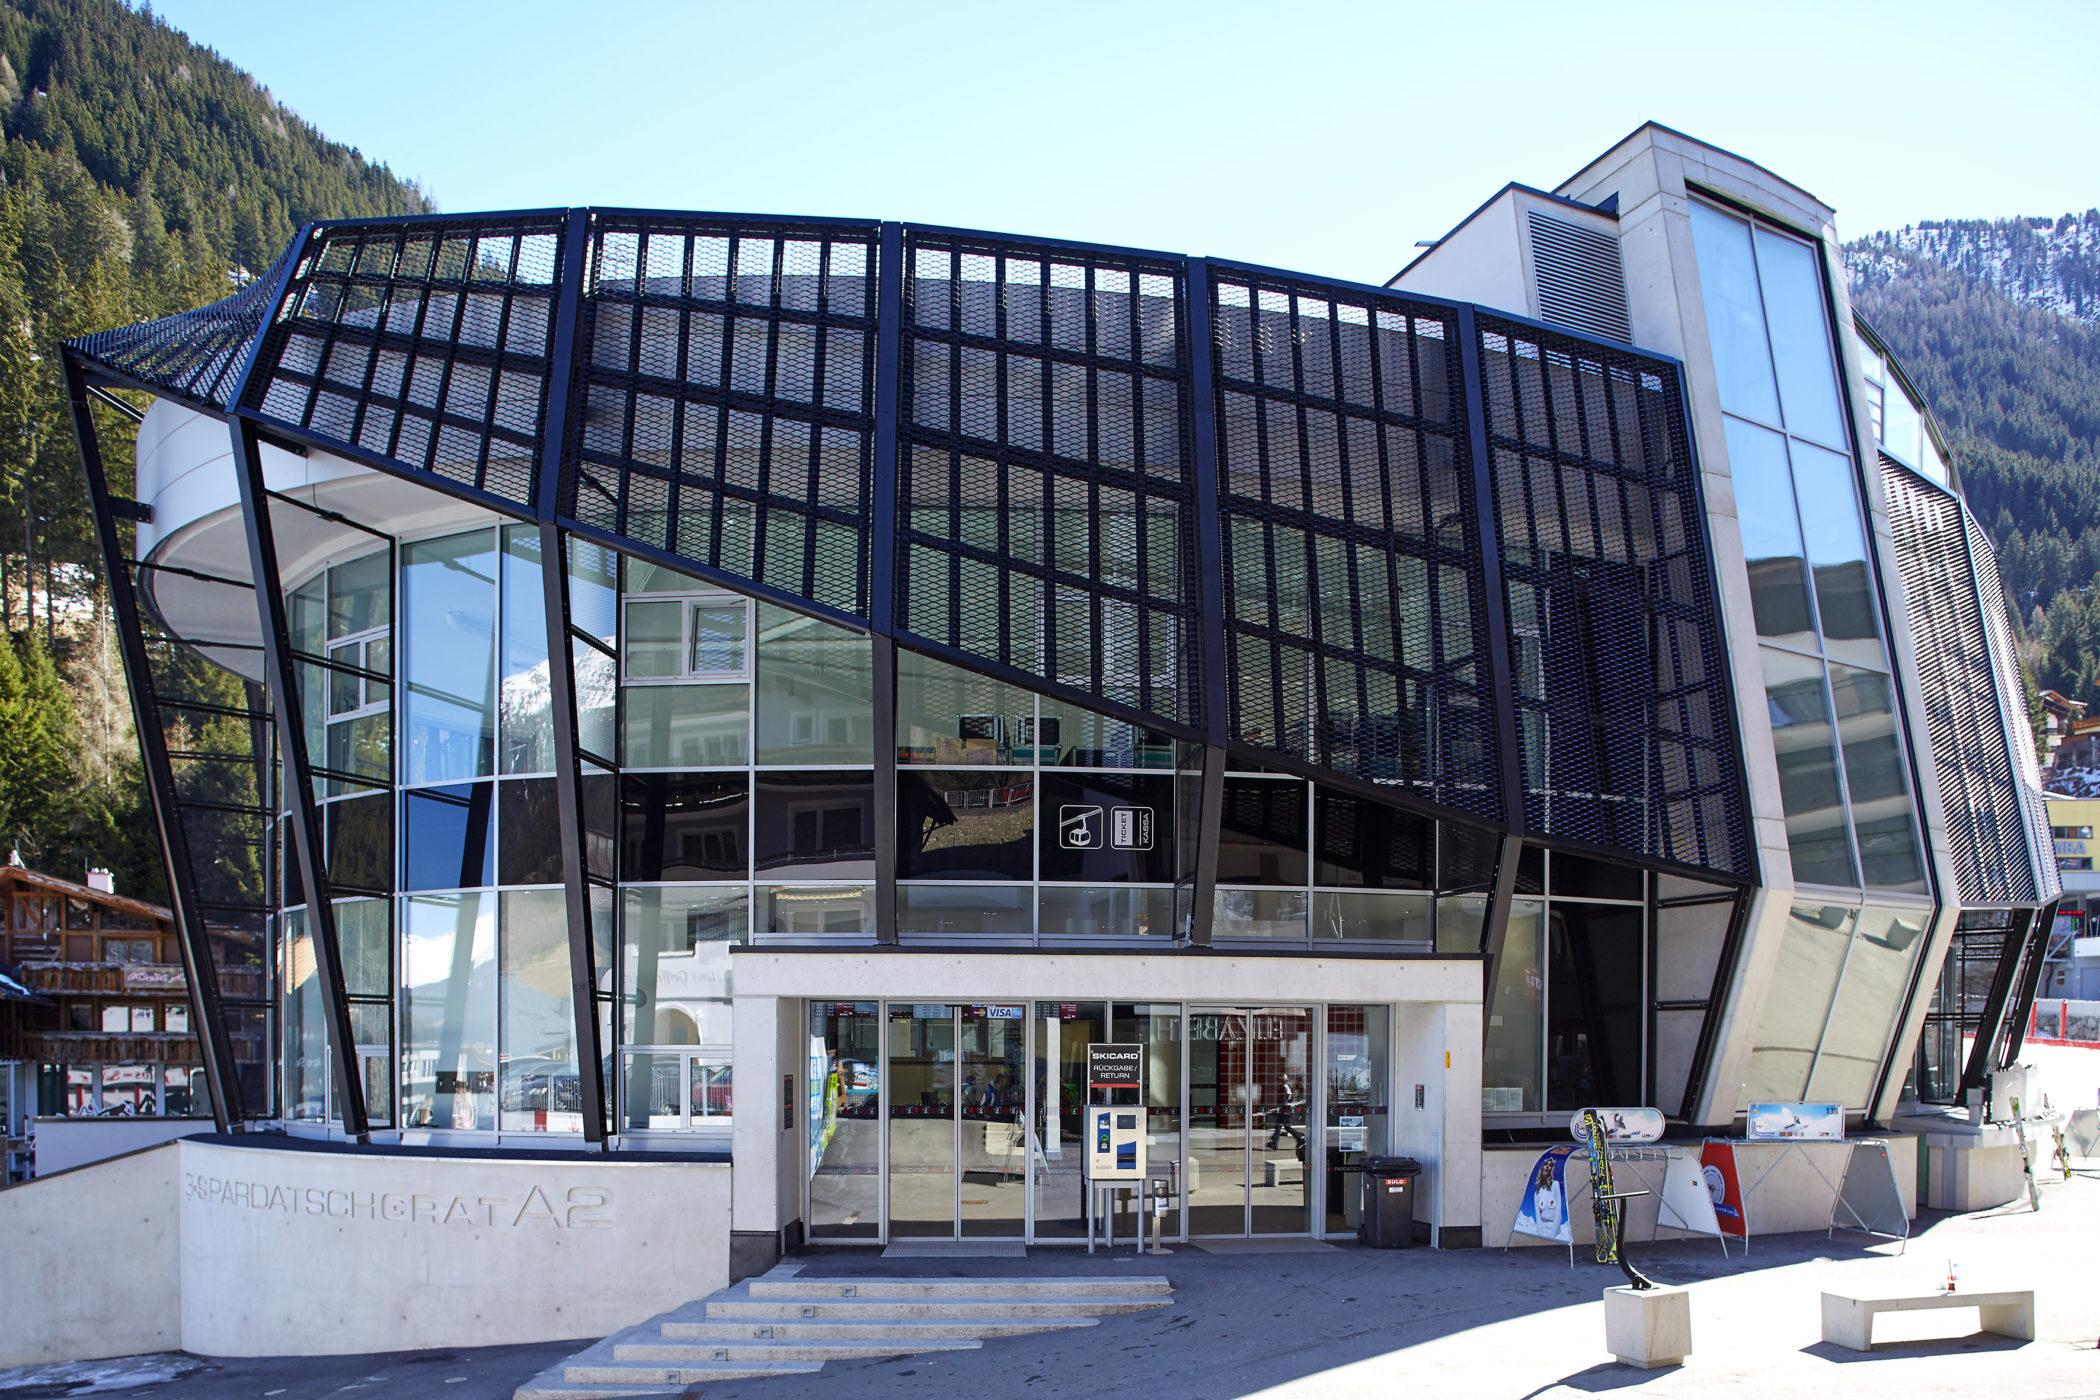 Pardatschgratbahn Ischgl, Prometall Fassade aus Streckmetall, Architektur